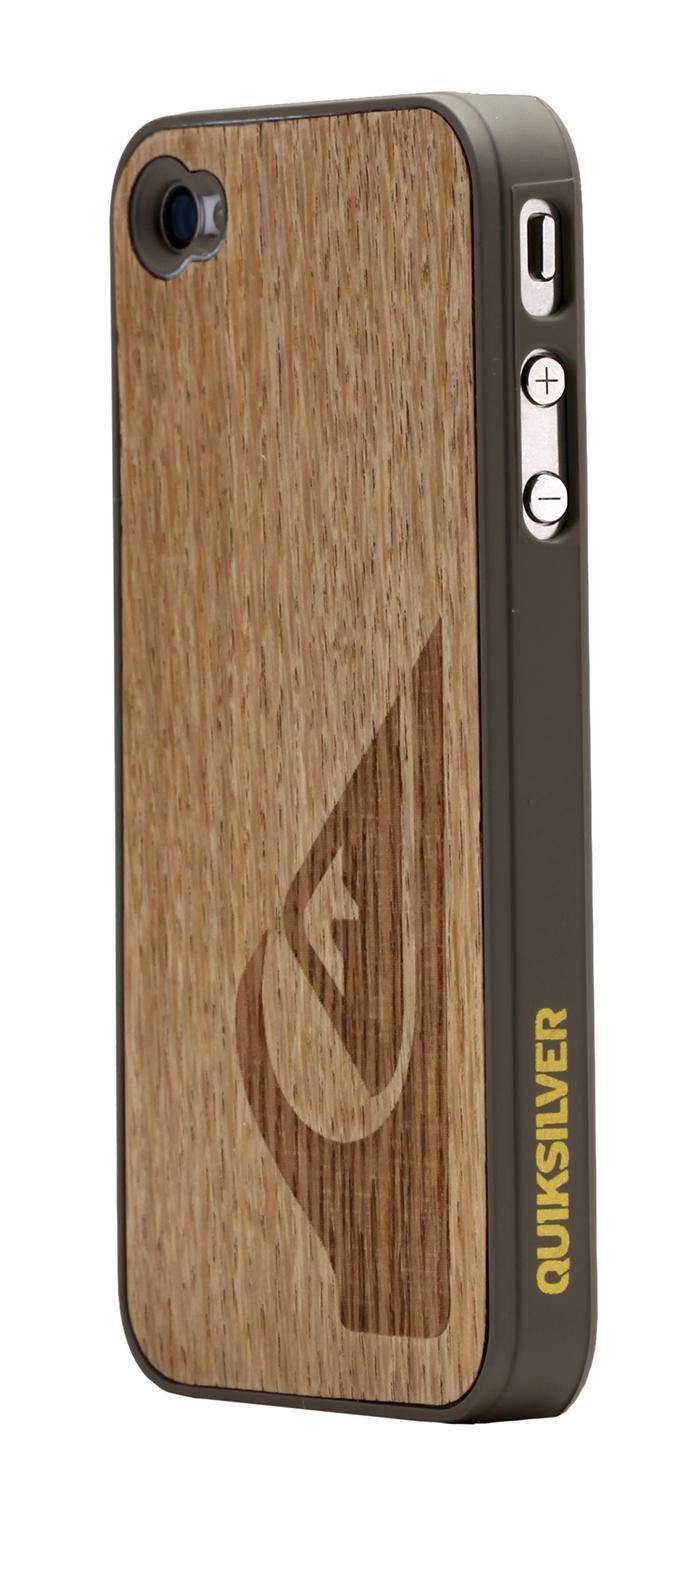 quiksilver clear wood hard case for iphone 4 4s bigben us bigben audio gaming. Black Bedroom Furniture Sets. Home Design Ideas